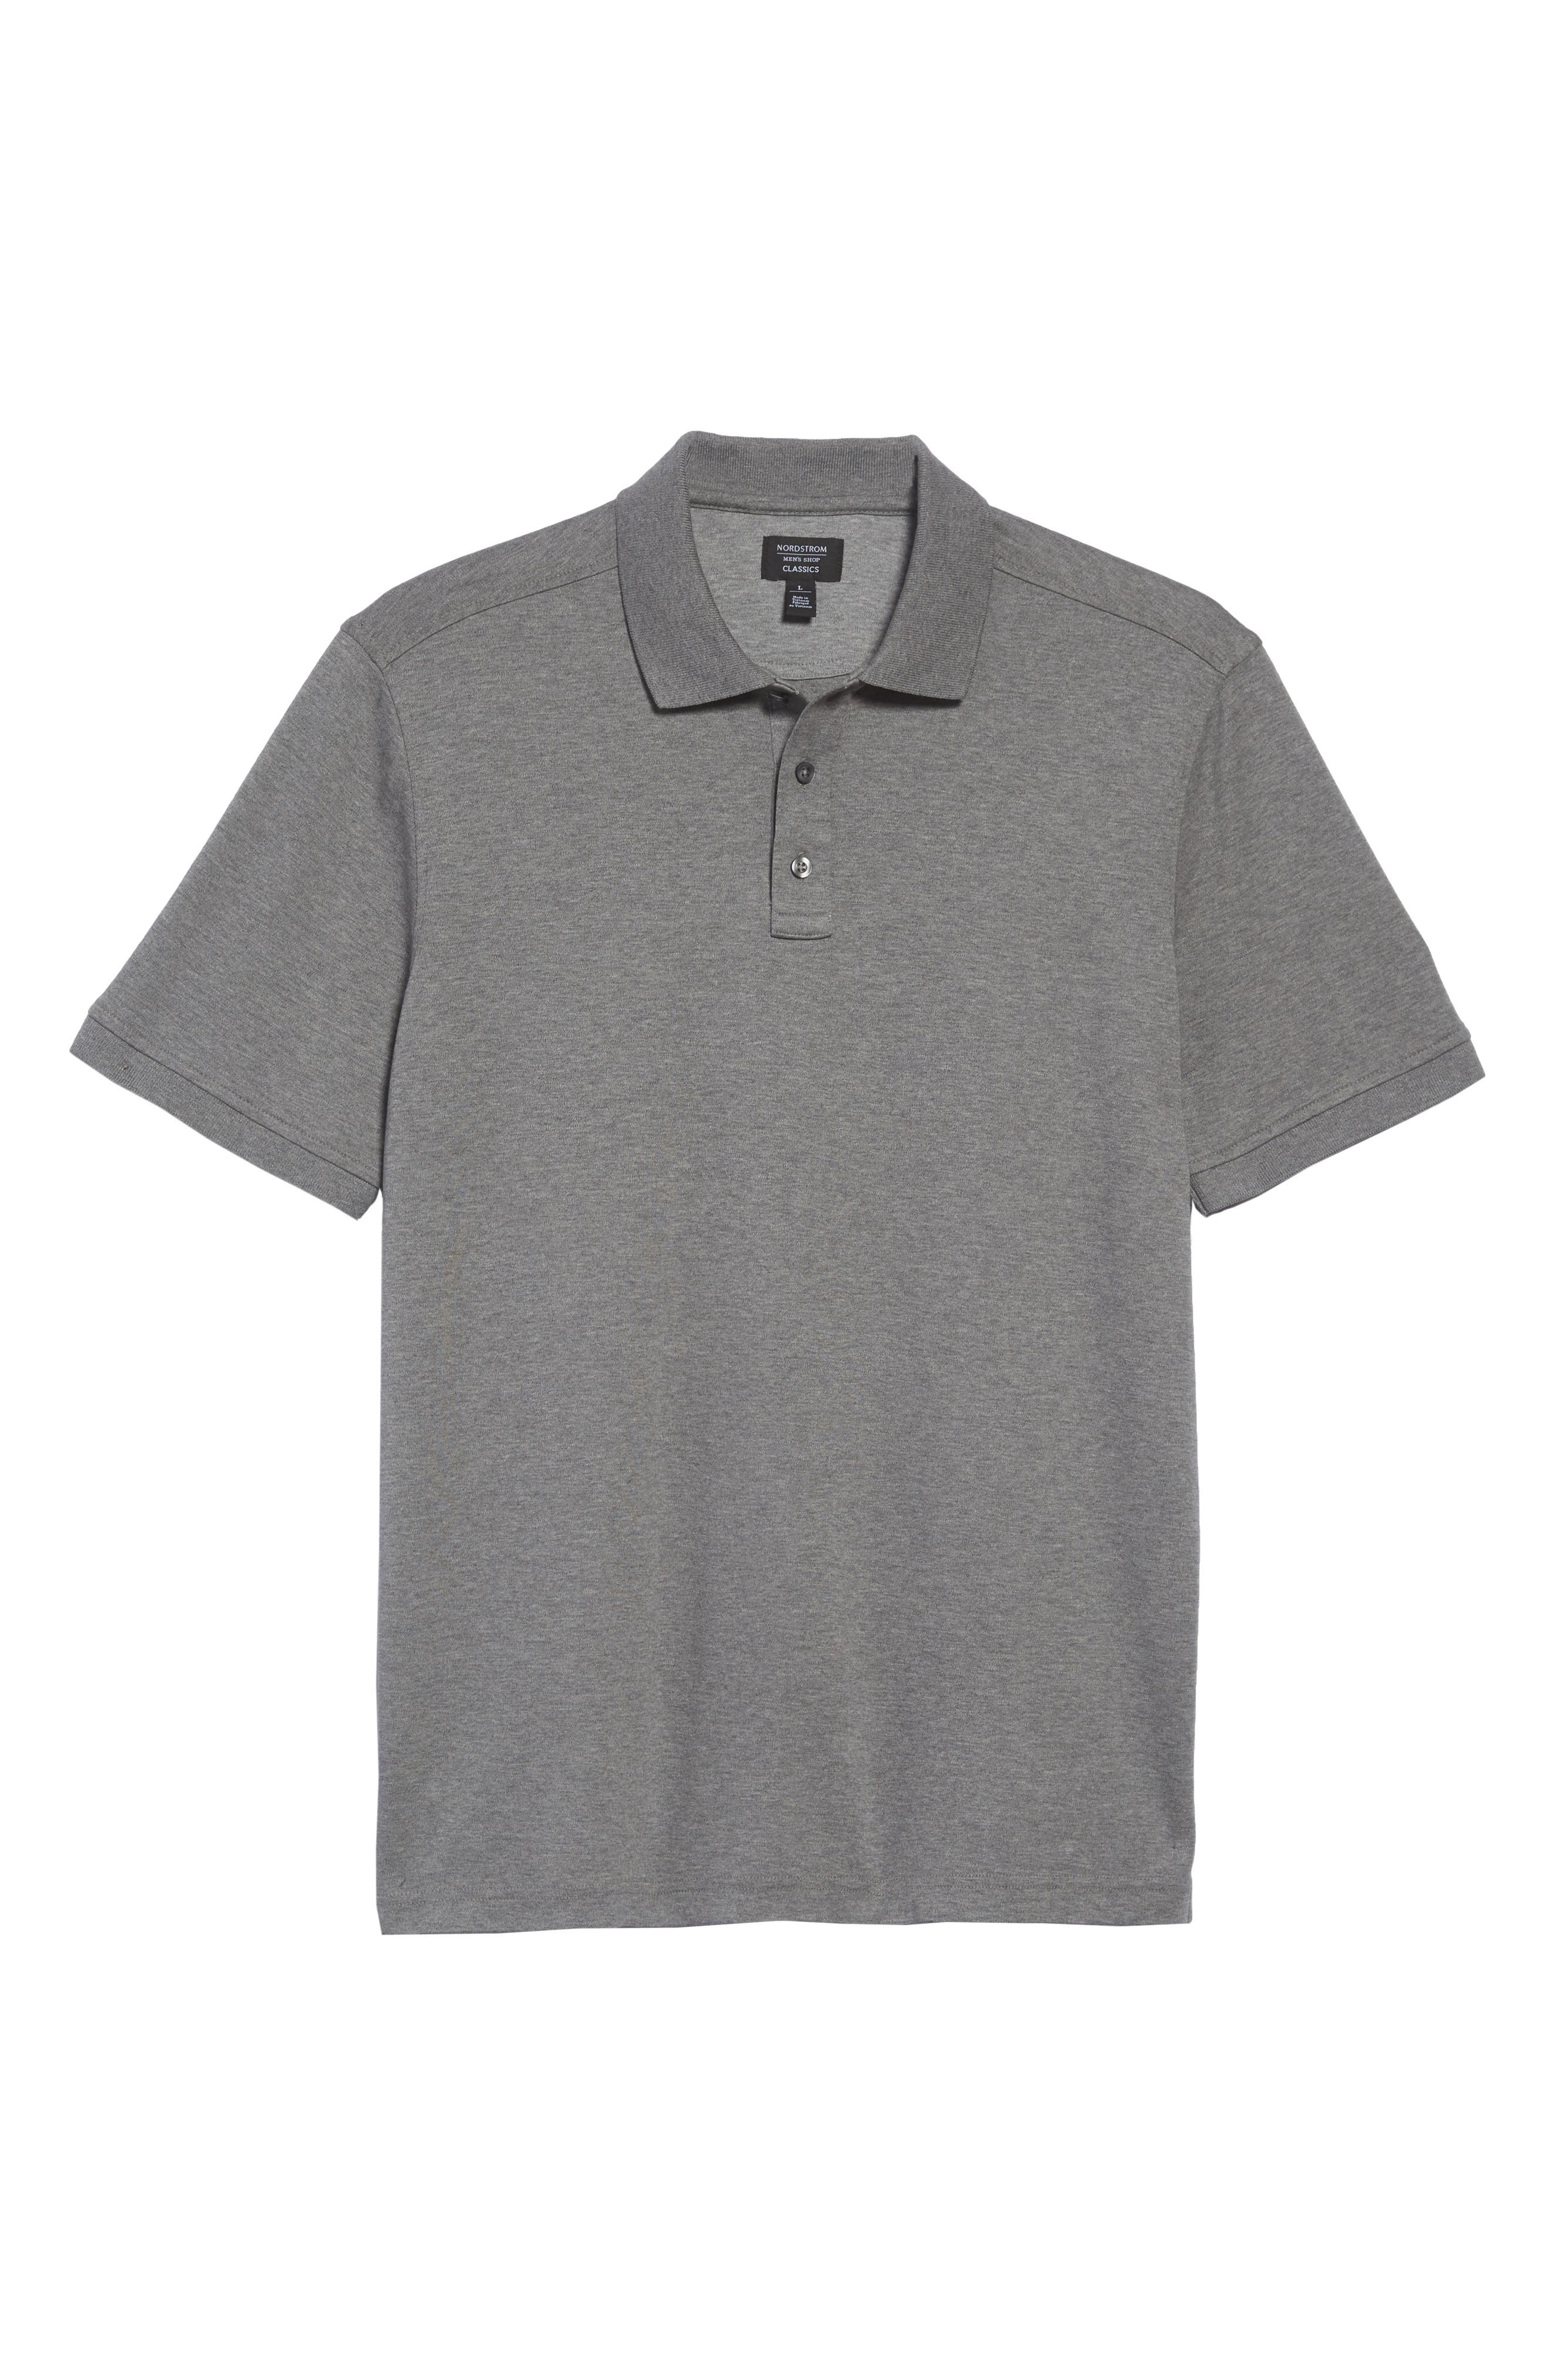 Regular Fit Interlock Knit Polo,                             Alternate thumbnail 4, color,                             GREY CLOUDY HEATHER